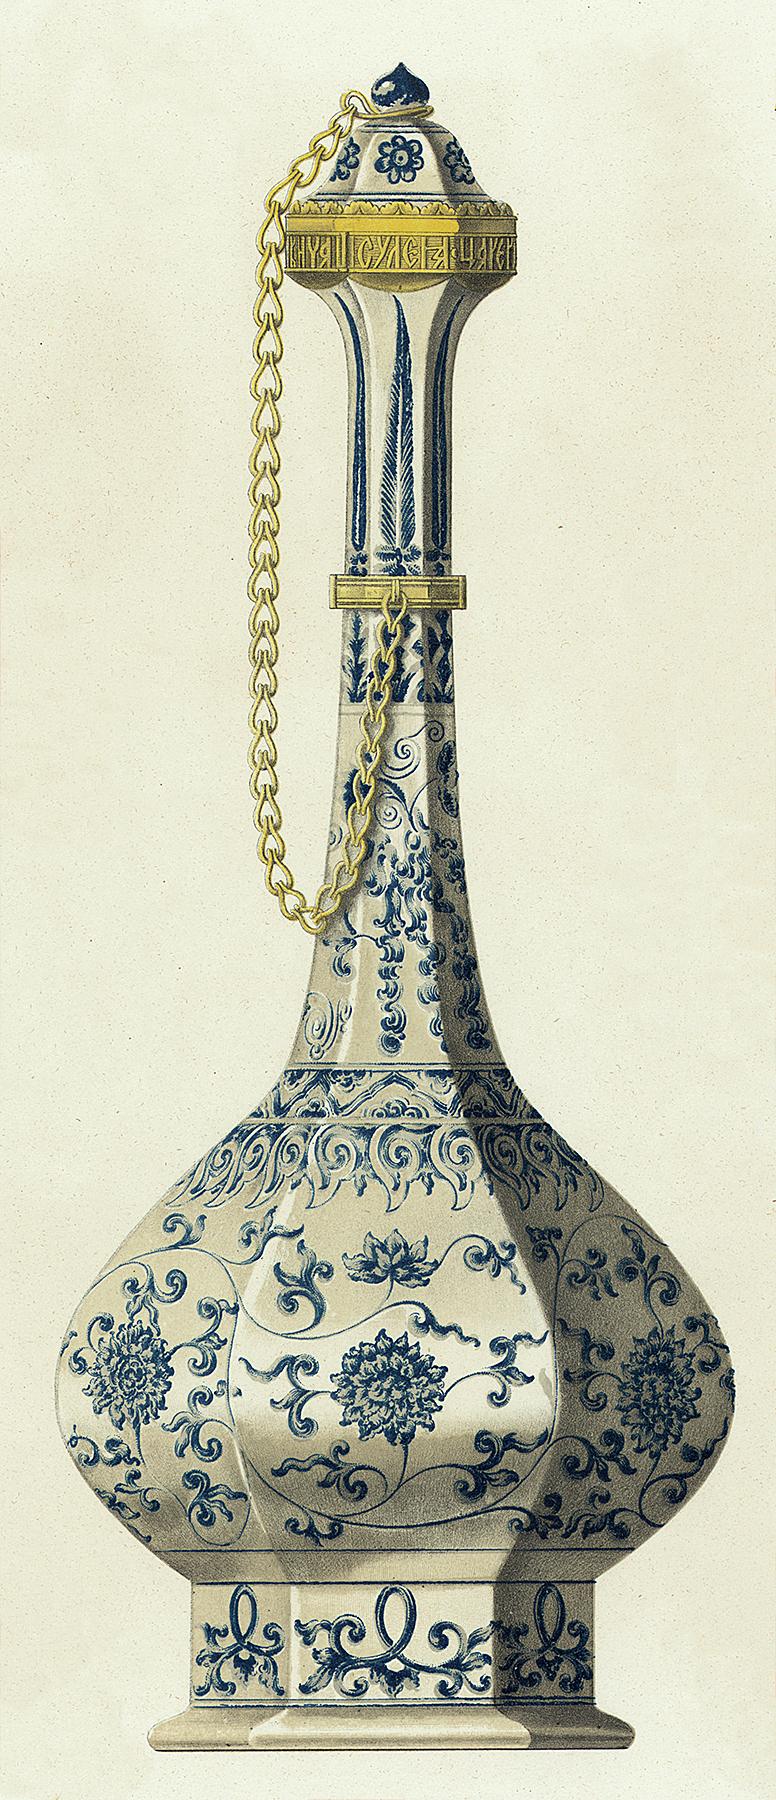 Vintage Ornate Blue and White Perfume Bottle Image